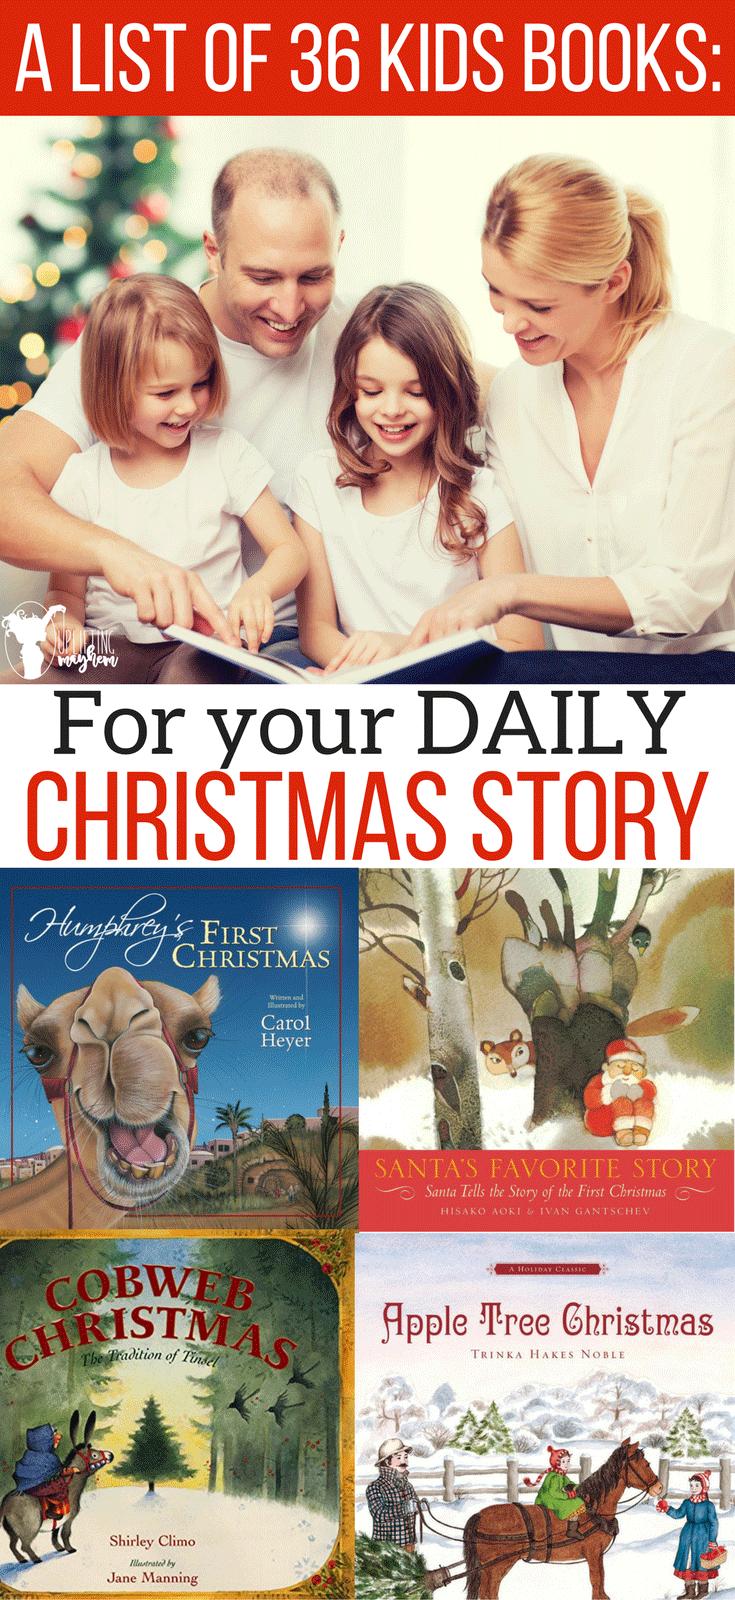 A List of 36 Christmas Kids Books for you daily Christmas story! Cute, inspirational, heartfelt and a variety of books for you this Christmas Season.